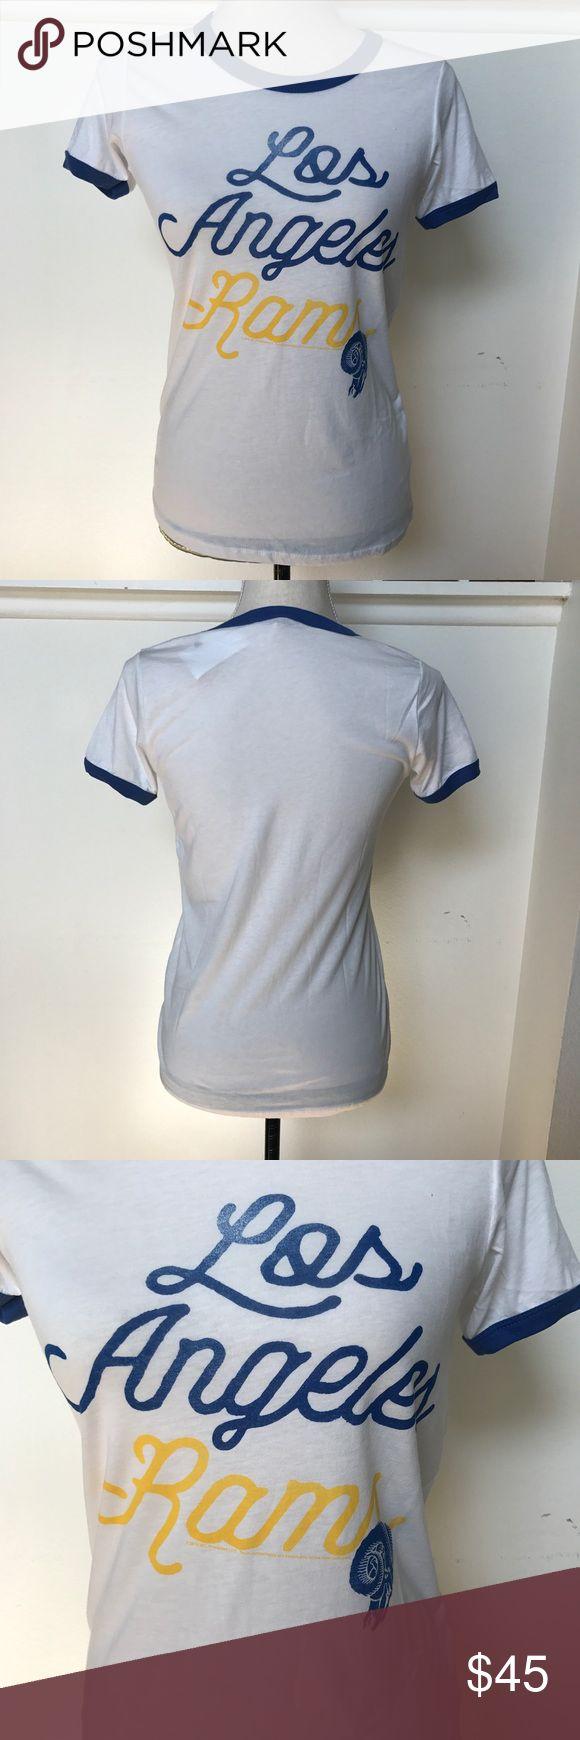 [Junk Food] Los Angeles Rams T-Shirt BNWT, excellent condition. Los Angeles Rams T-Shirt, super soft material, very comfortable. Smoke free home, no modeling and no trades Junk Food Tops Tees - Short Sleeve